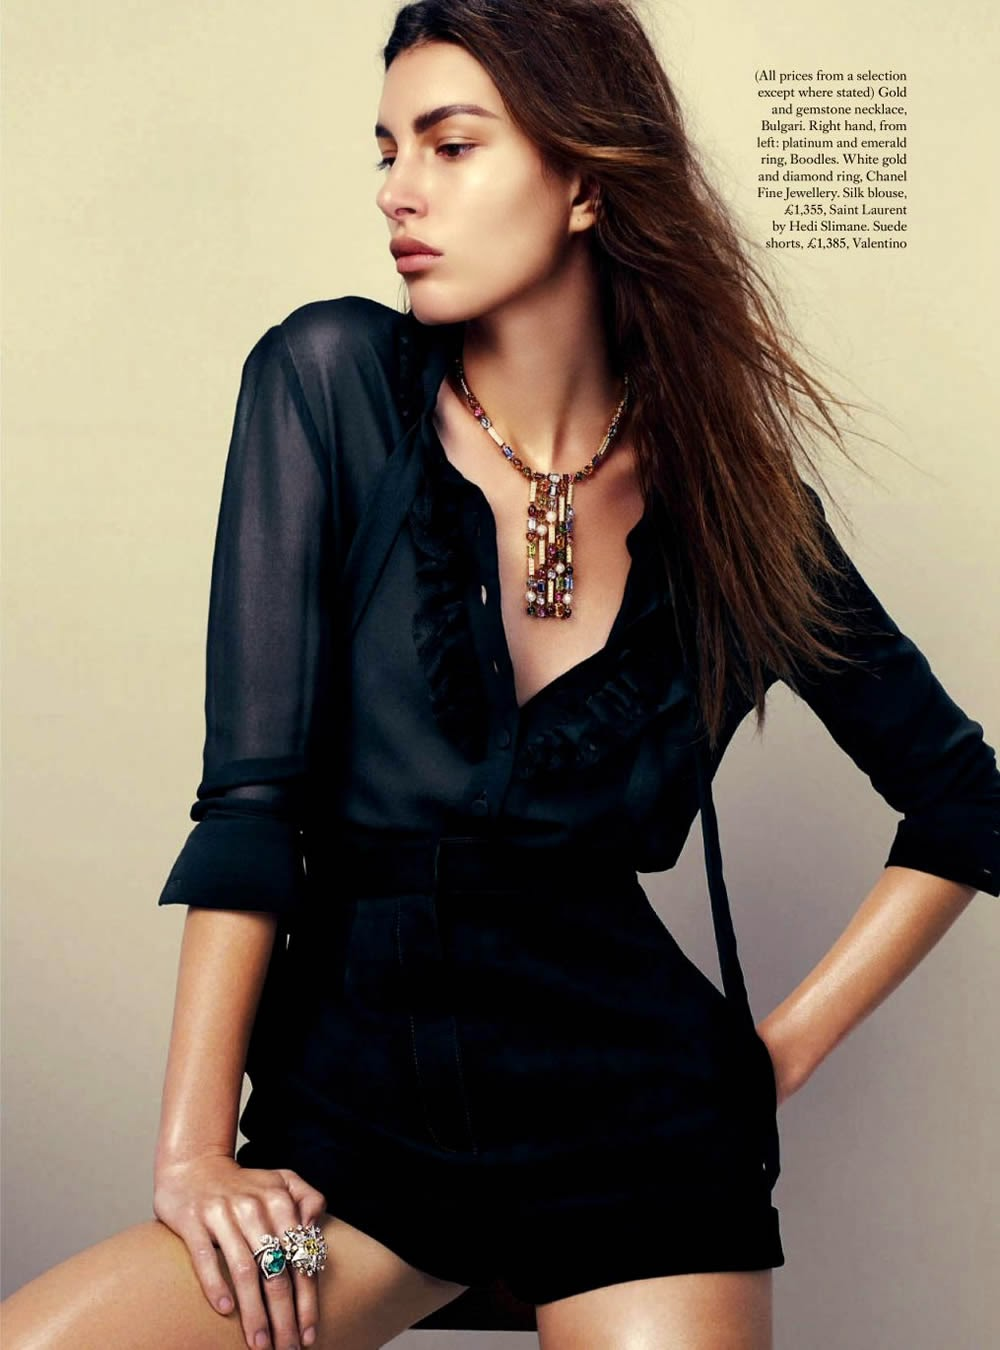 Kate King by David Slijper for Harper's Bazaar UK, March 2014